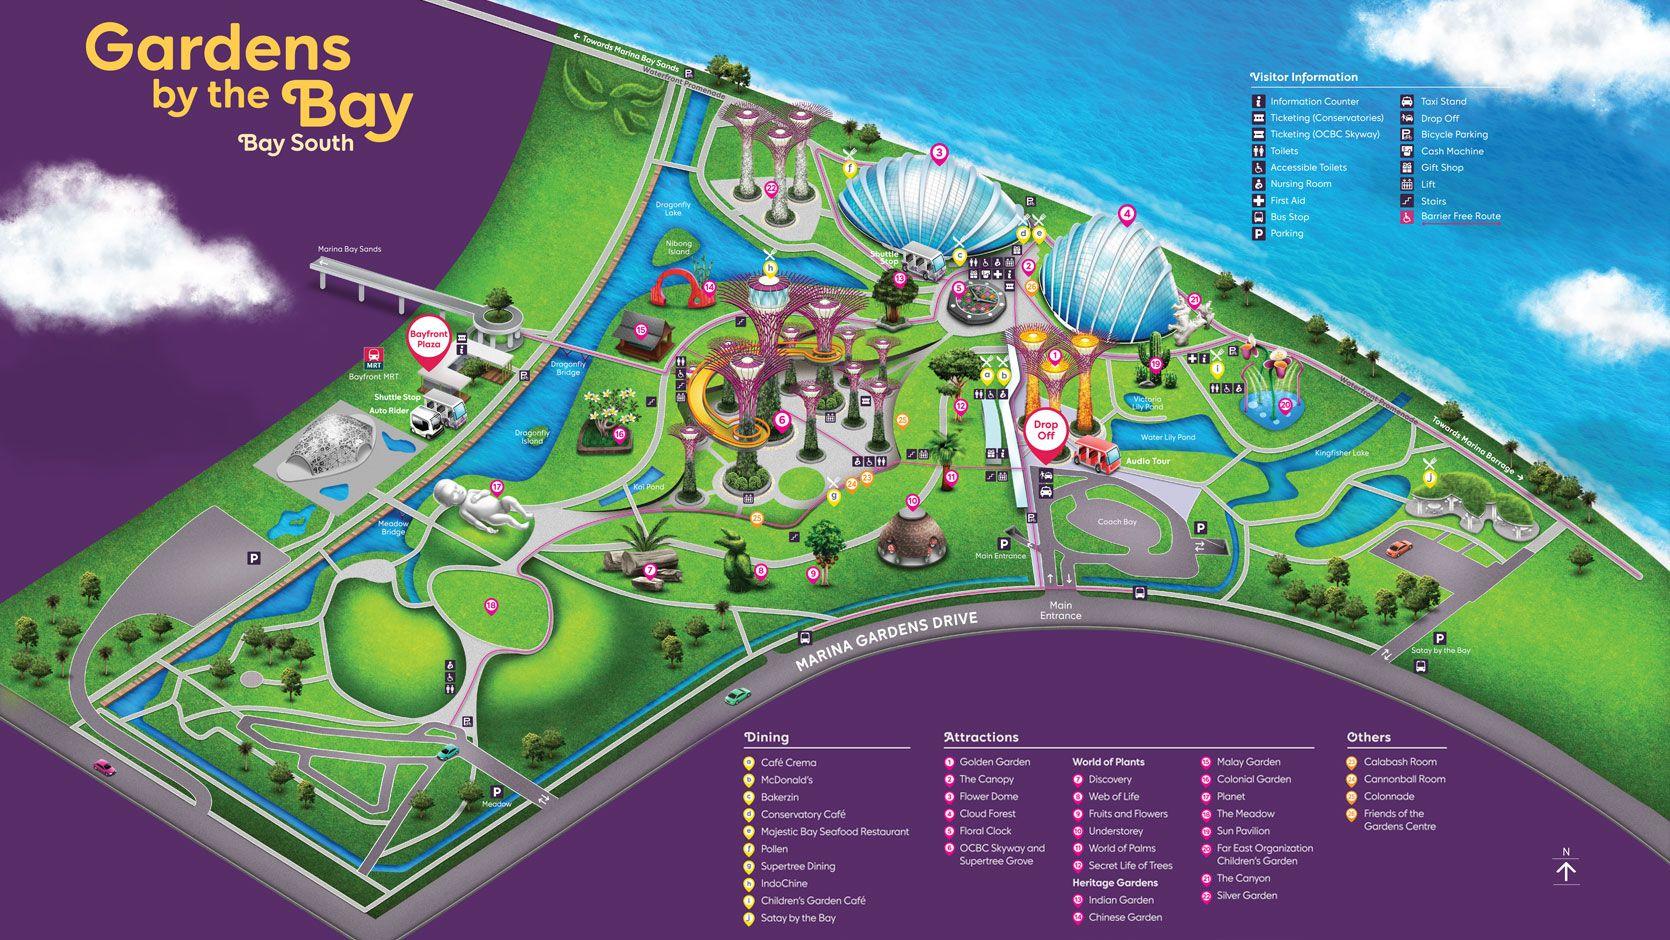 74c548c844f8858e84f21a079ea622ad - How To Visit Gardens By The Bay